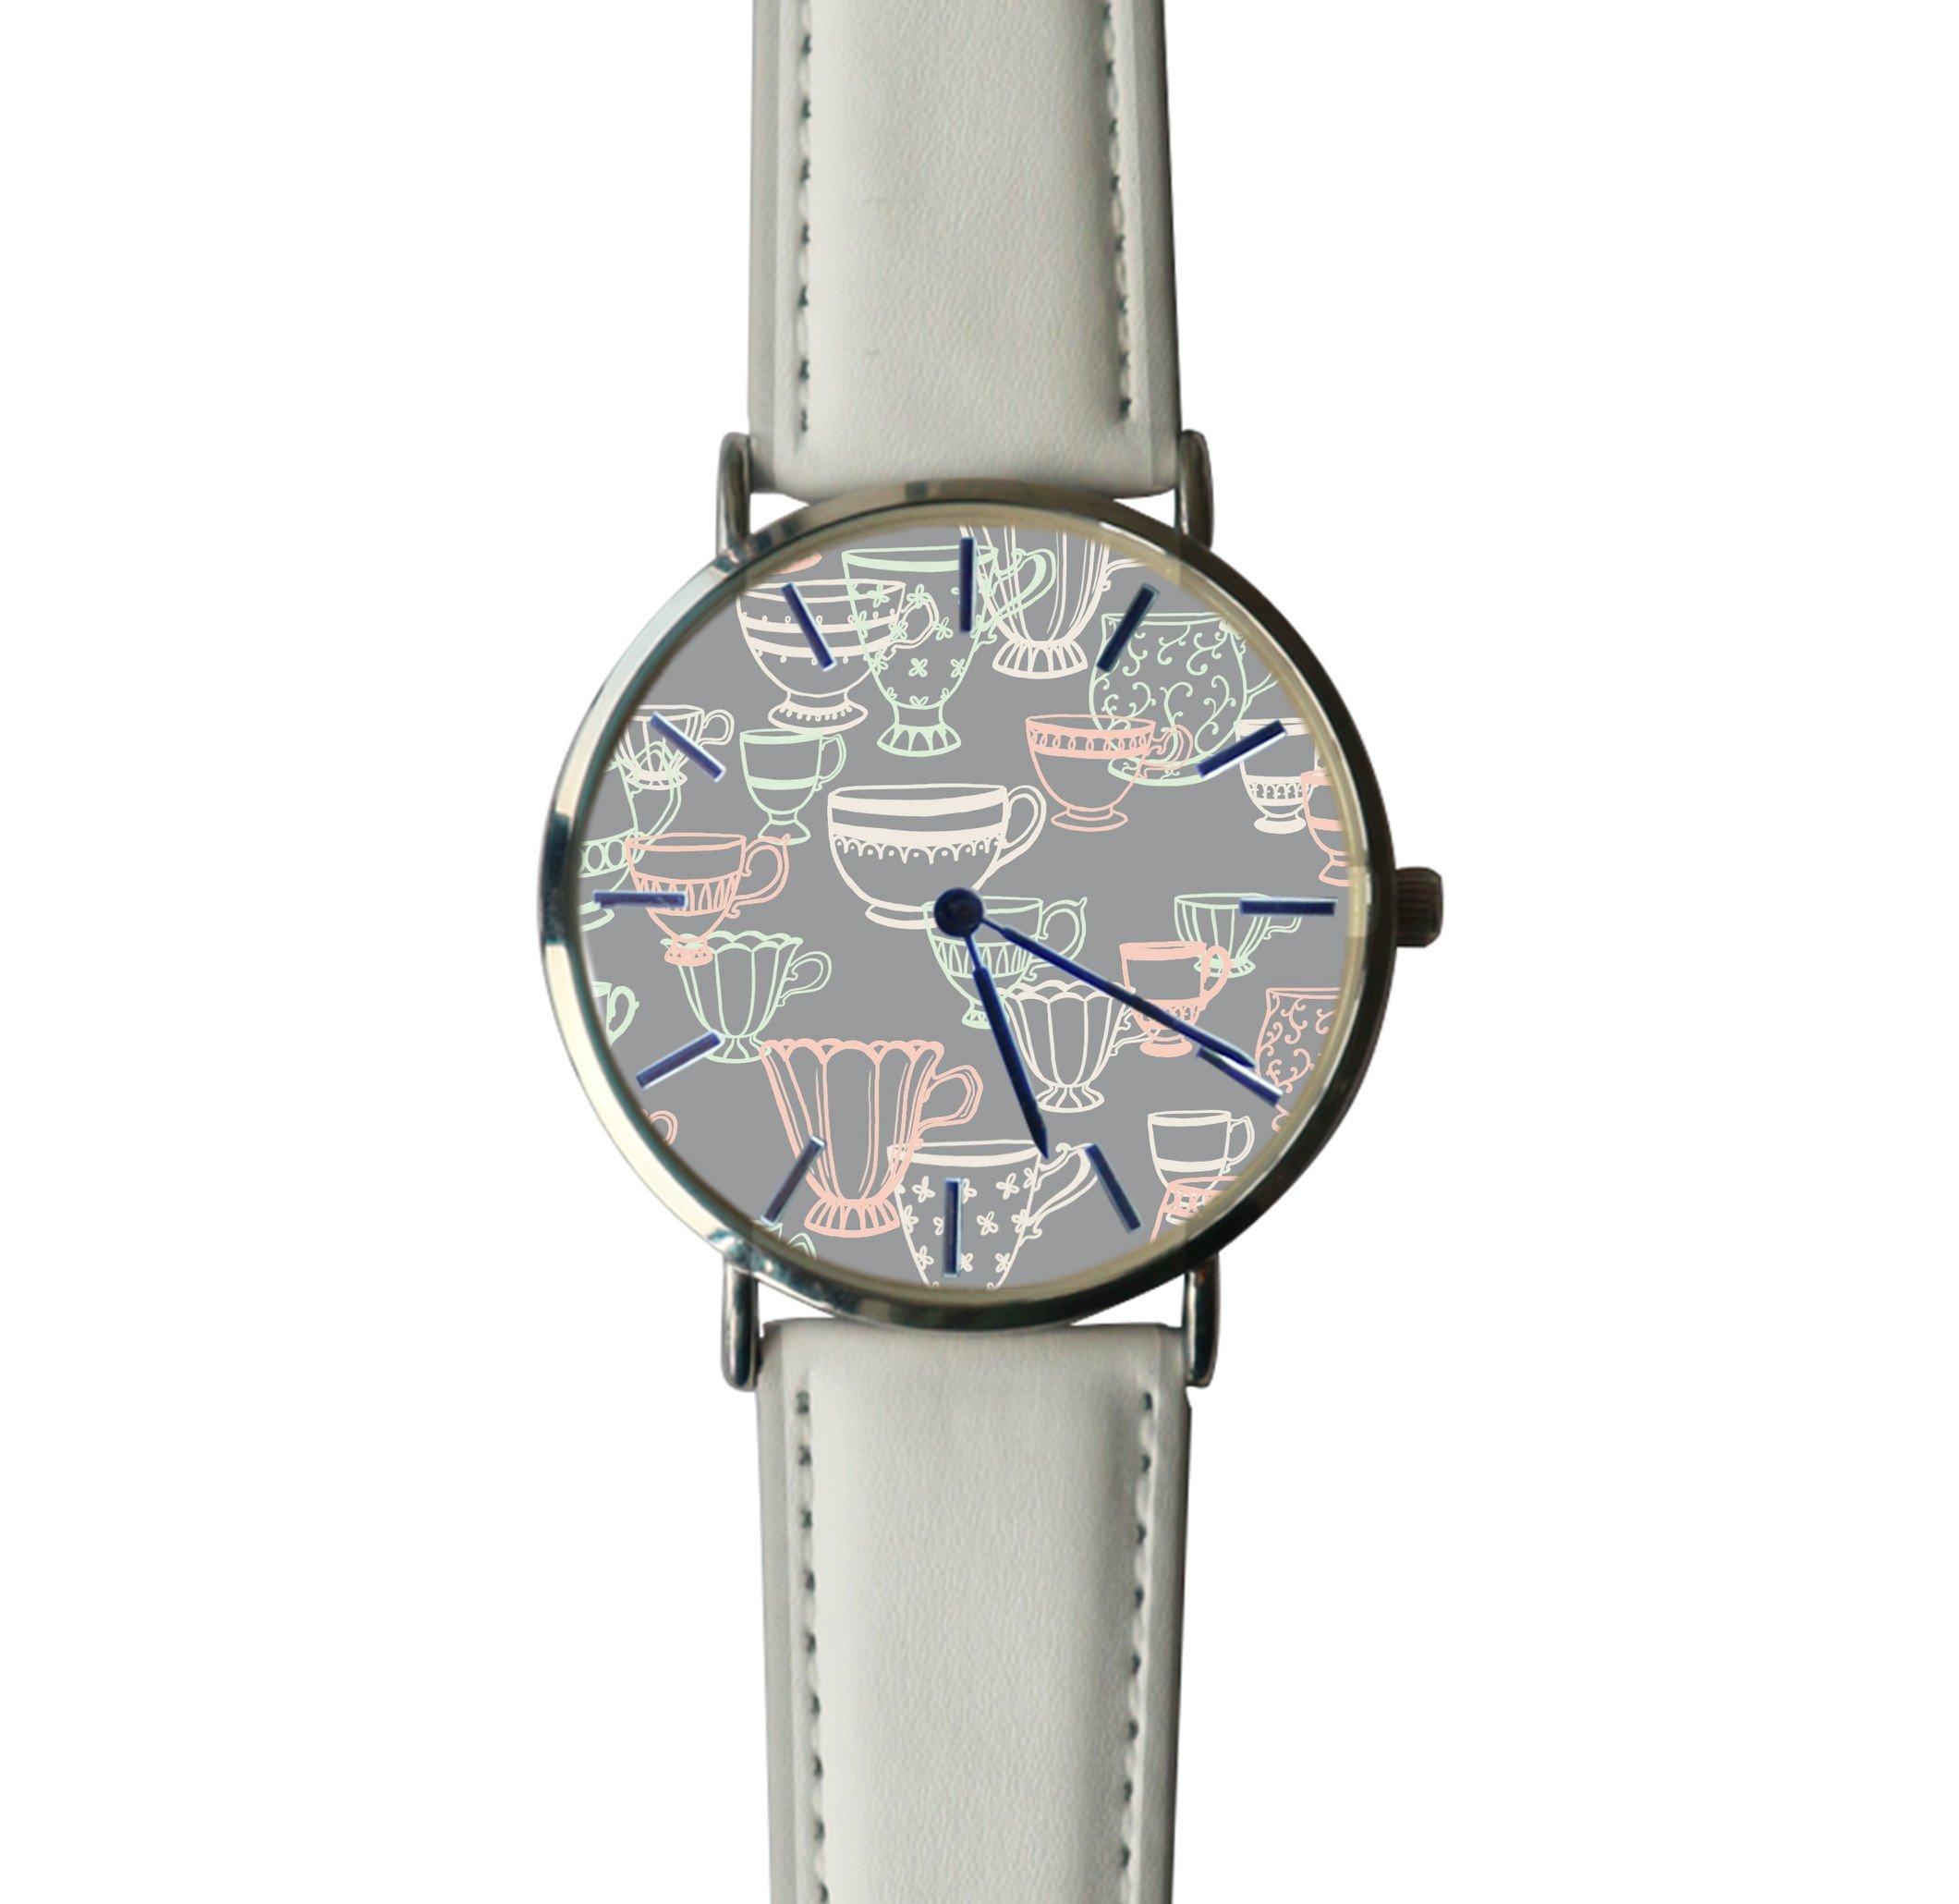 JISJJCKJSX Gray Teacup custom watches quartz watch stainless steel case